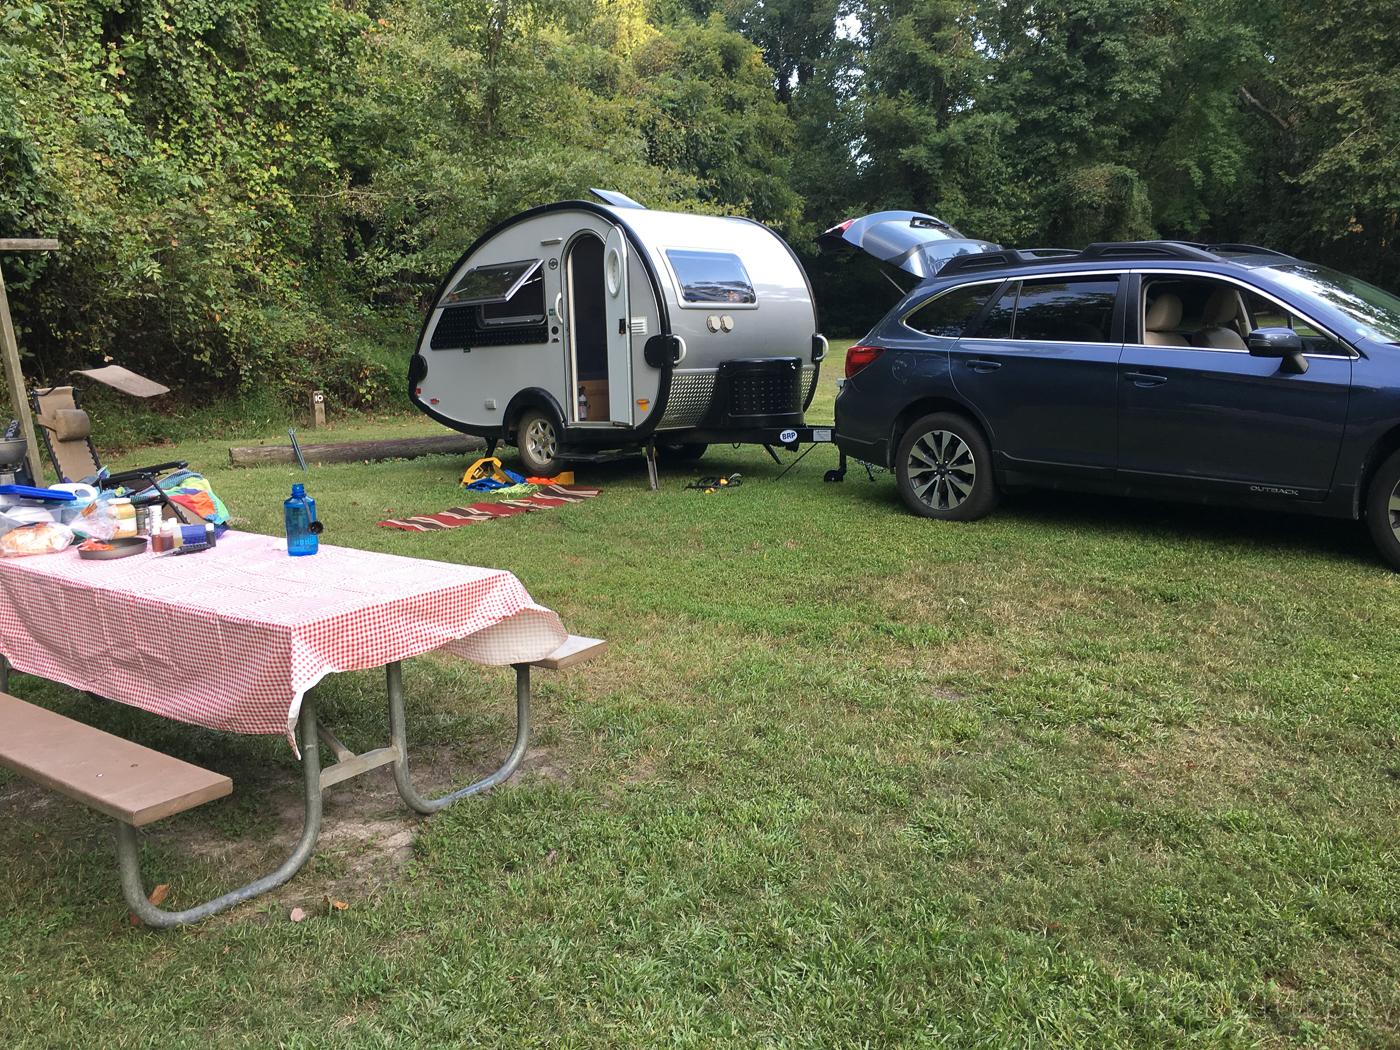 Campsite at Pettigrew State Park